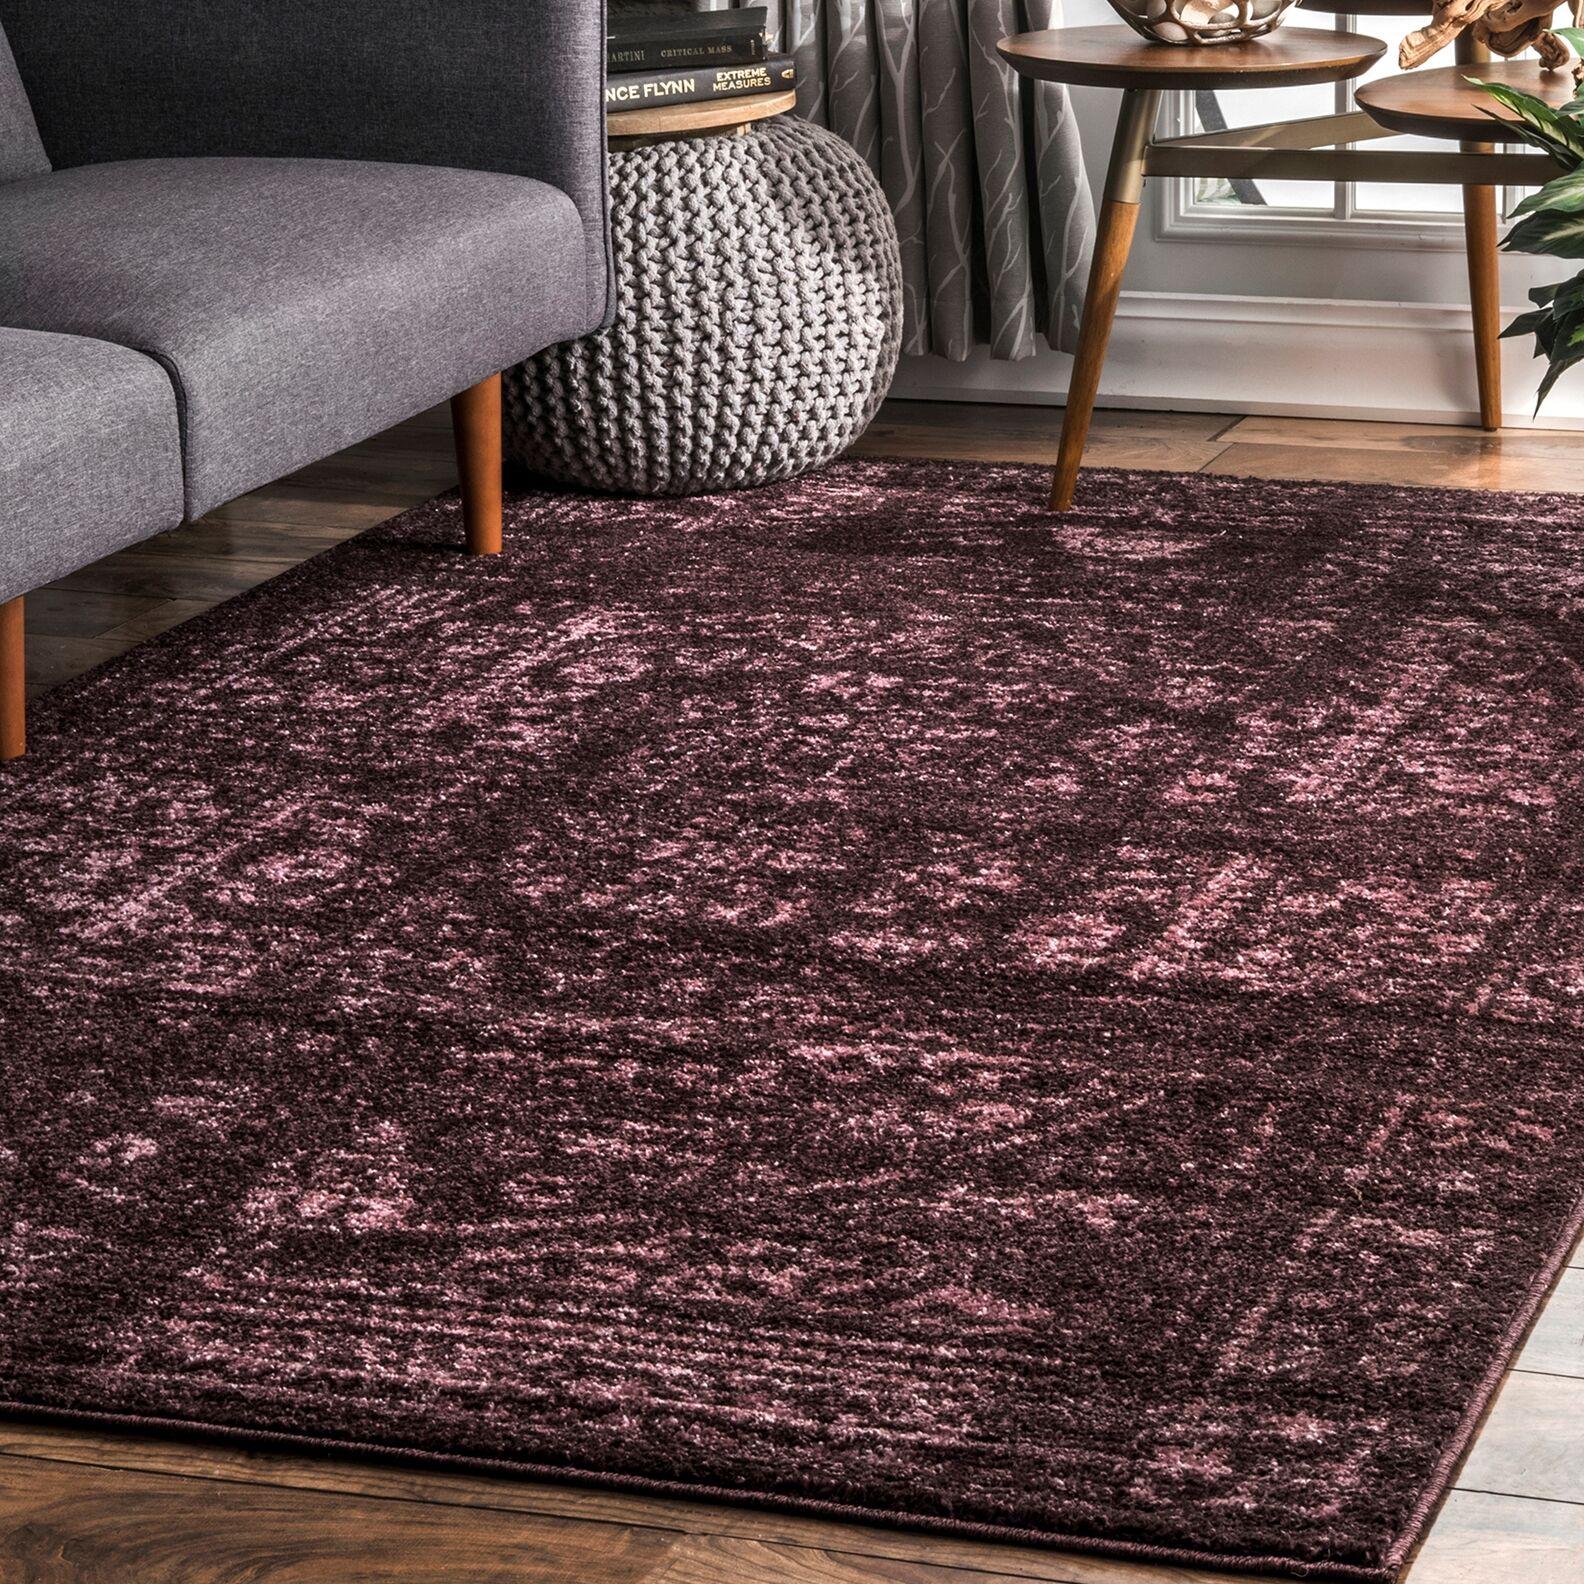 Fegan Dark Gray Area Rug Rug Size: Rectangle 5' x 8'